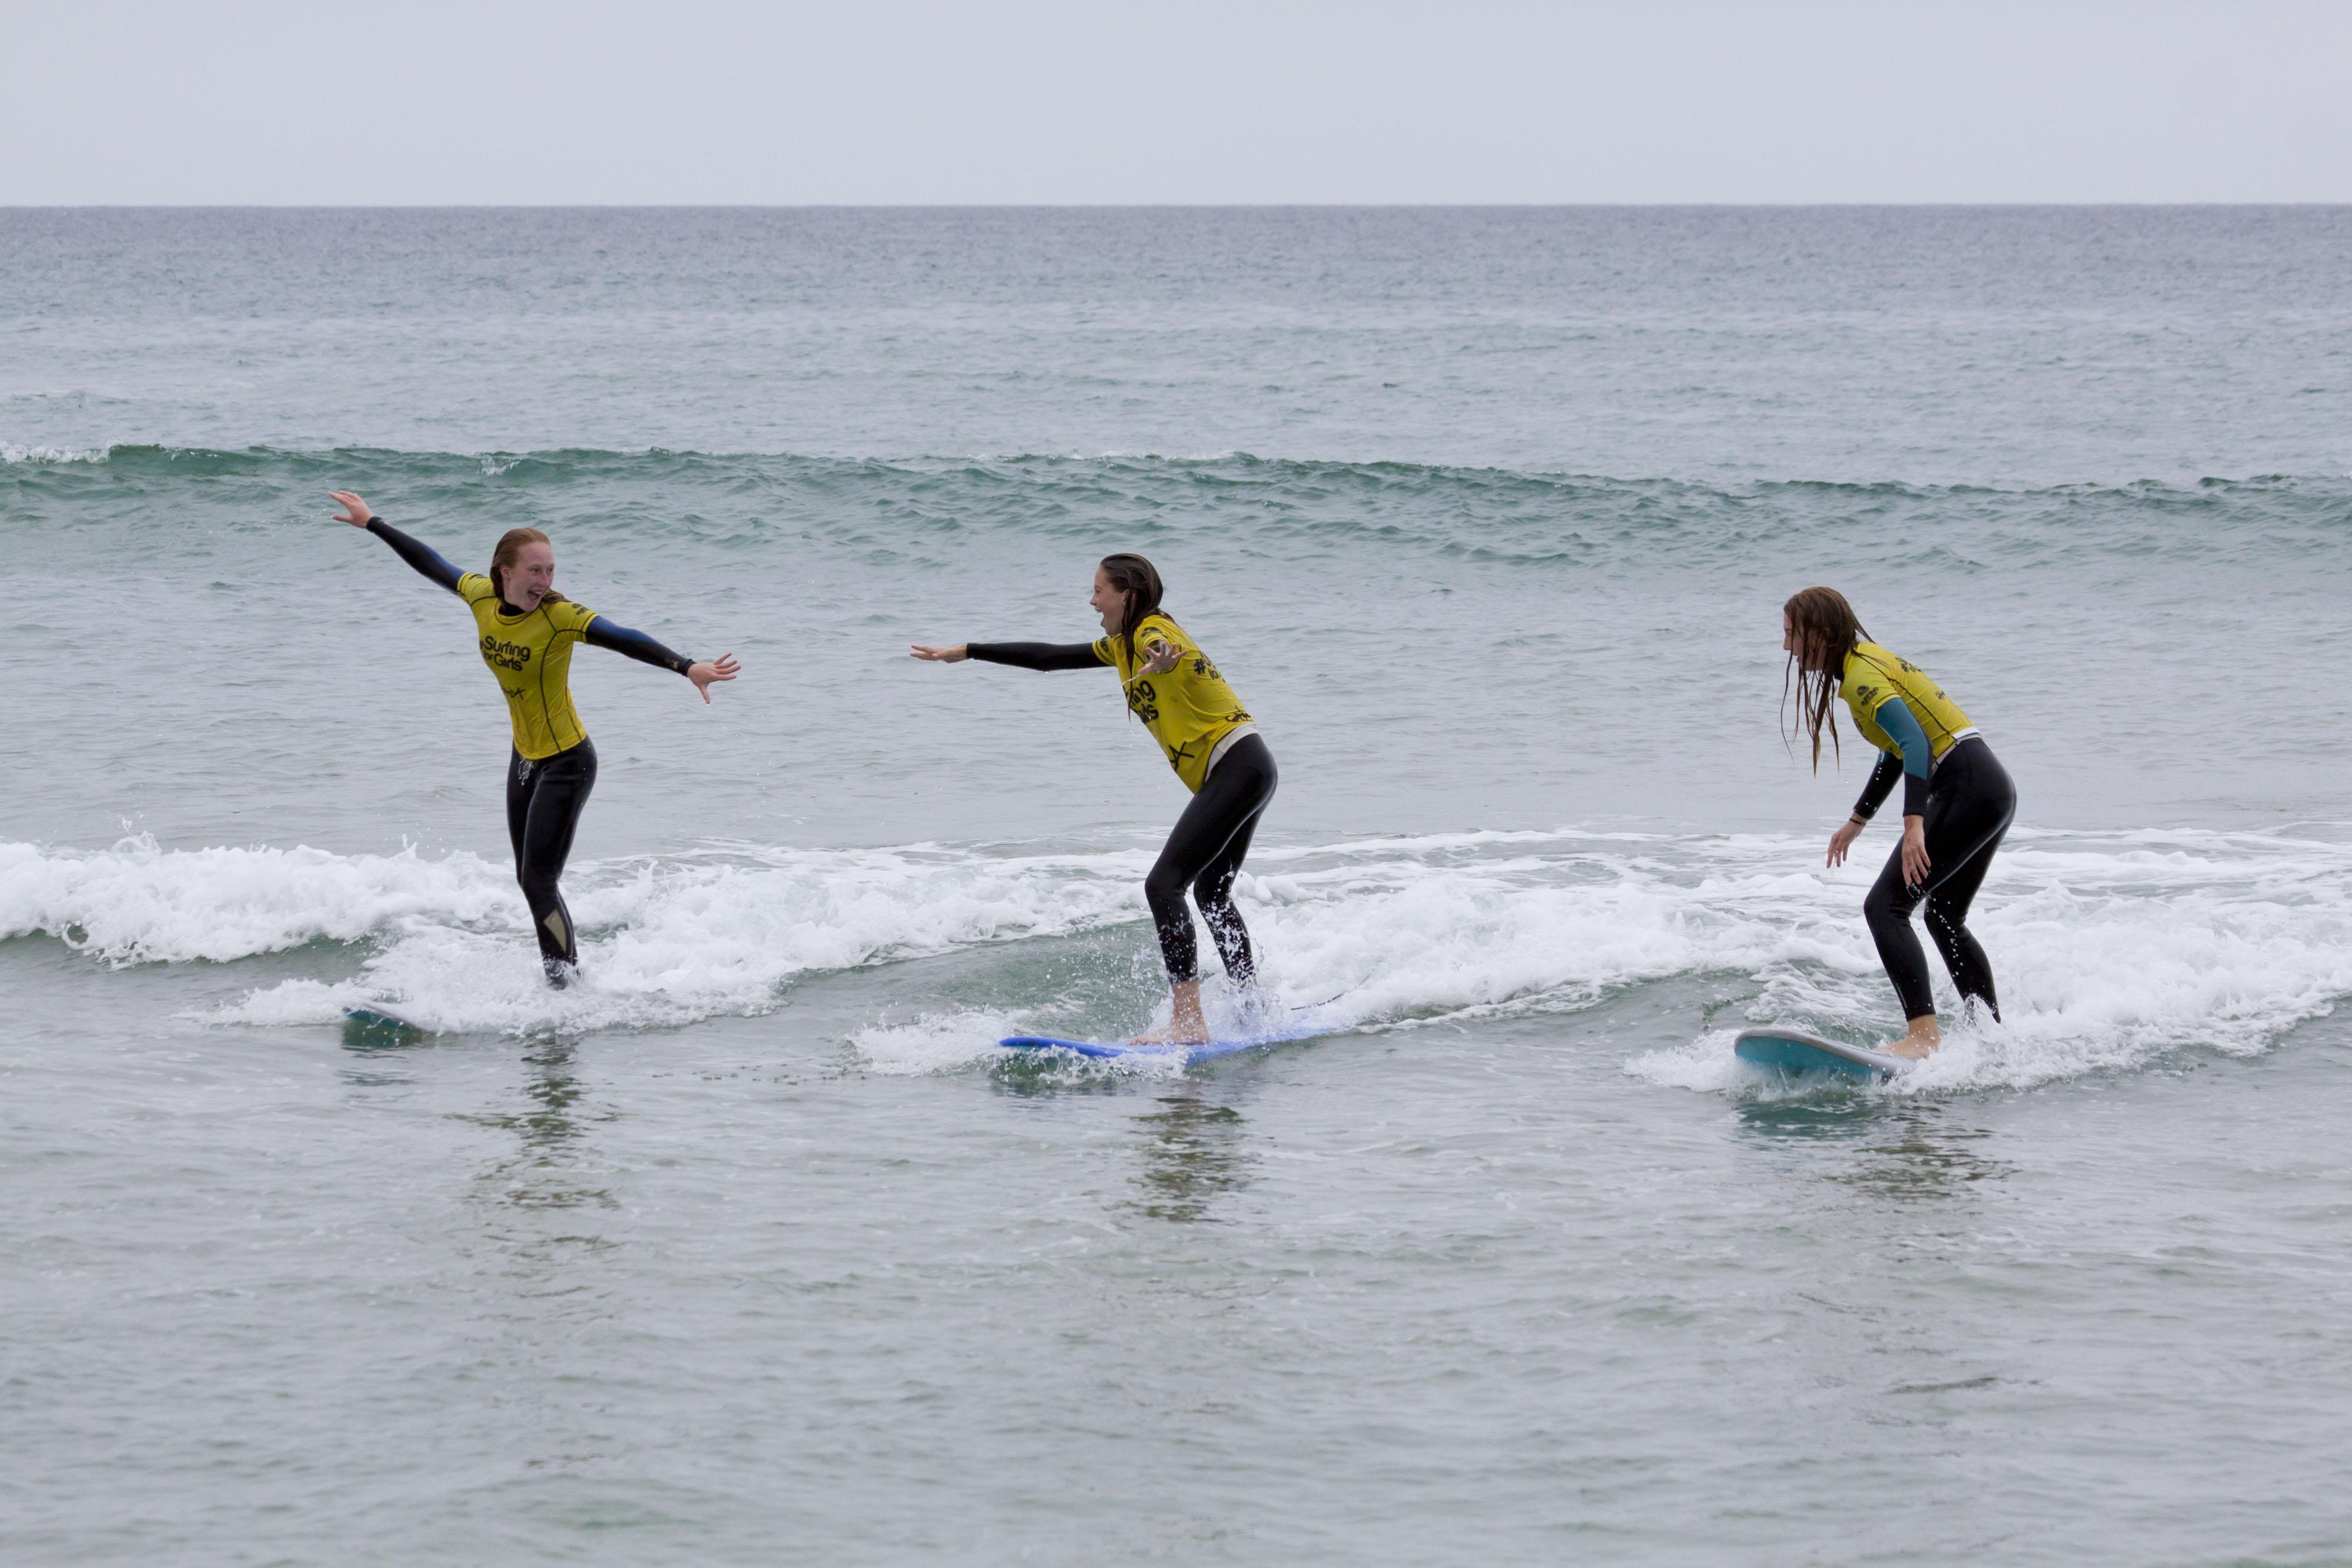 Phillip Island Surfi